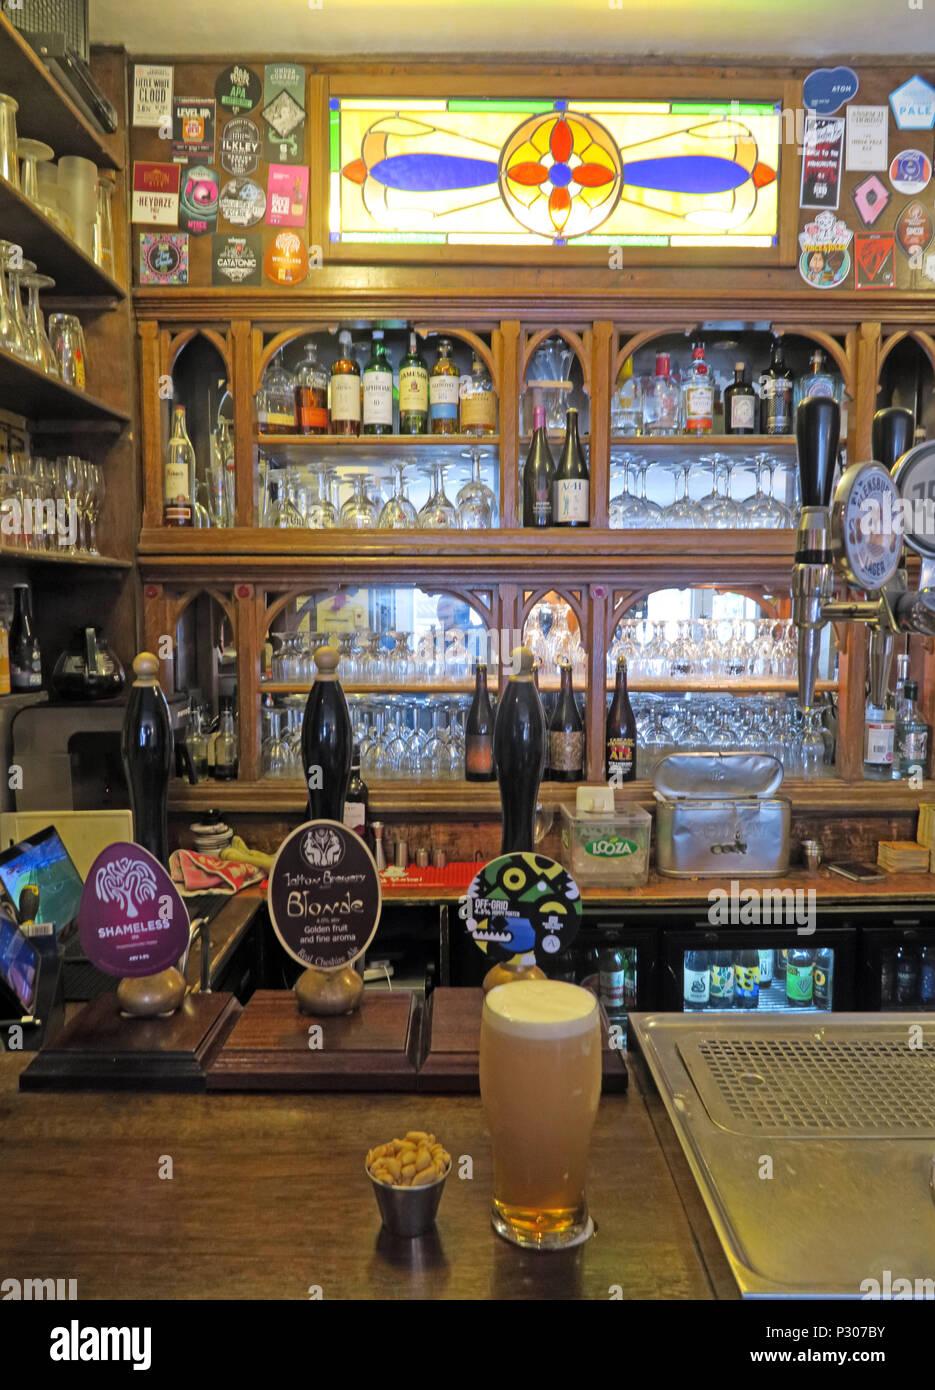 PI bar, Altrincham, Trafford, Greater Manchester, North West England, UK - Stock Image